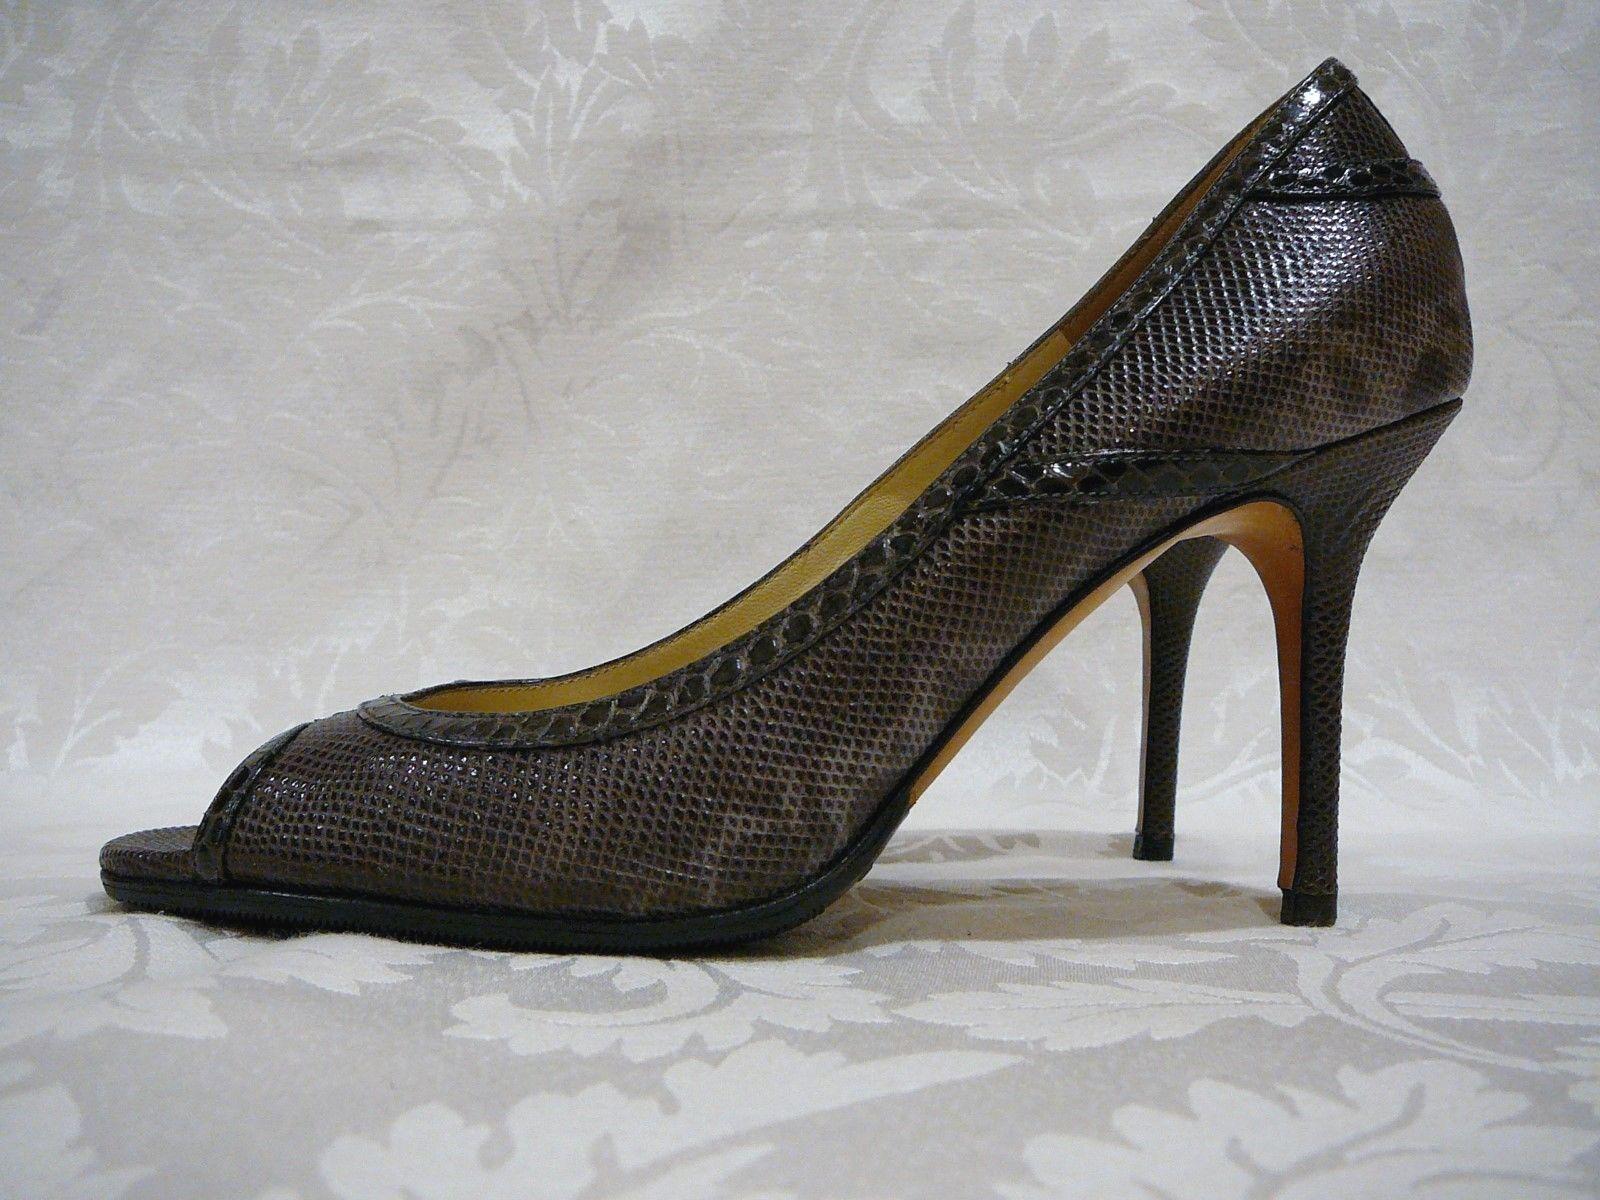 Jimmy Choo High Heels Peau de Serpent Bout Ouvert Escarpins T 38 1 2 US 8 1 2 Made in